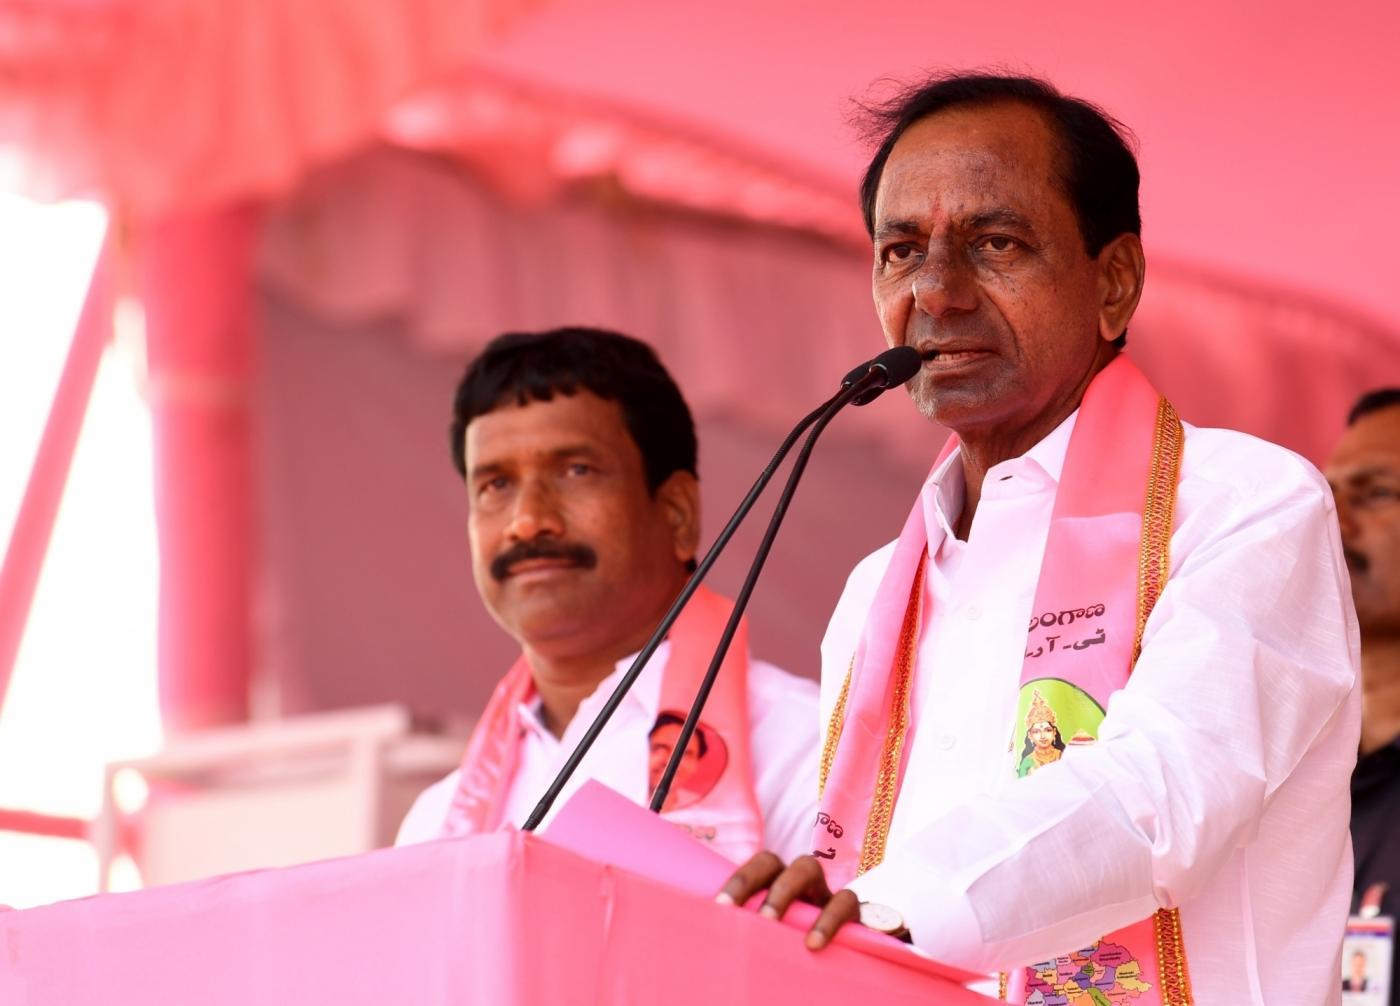 Kodangal: Telangana Rashtra Samithi (TRS) chief K Chandrasekhar Rao addresses a party rally at Kodangal in Mahbubnagar District of Telangana on Dec 4, 2018. (Photo: IANS) by .